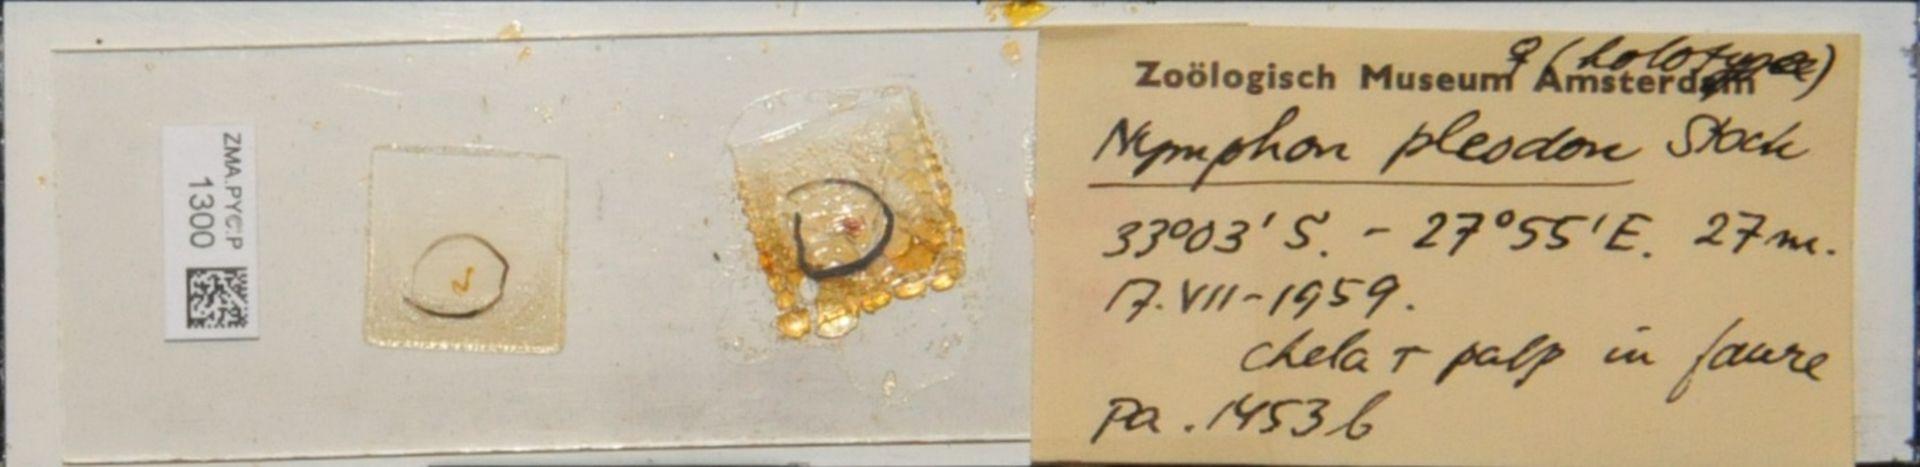 ZMA.PYC.P.1300 | Nymphon pleodon Stock